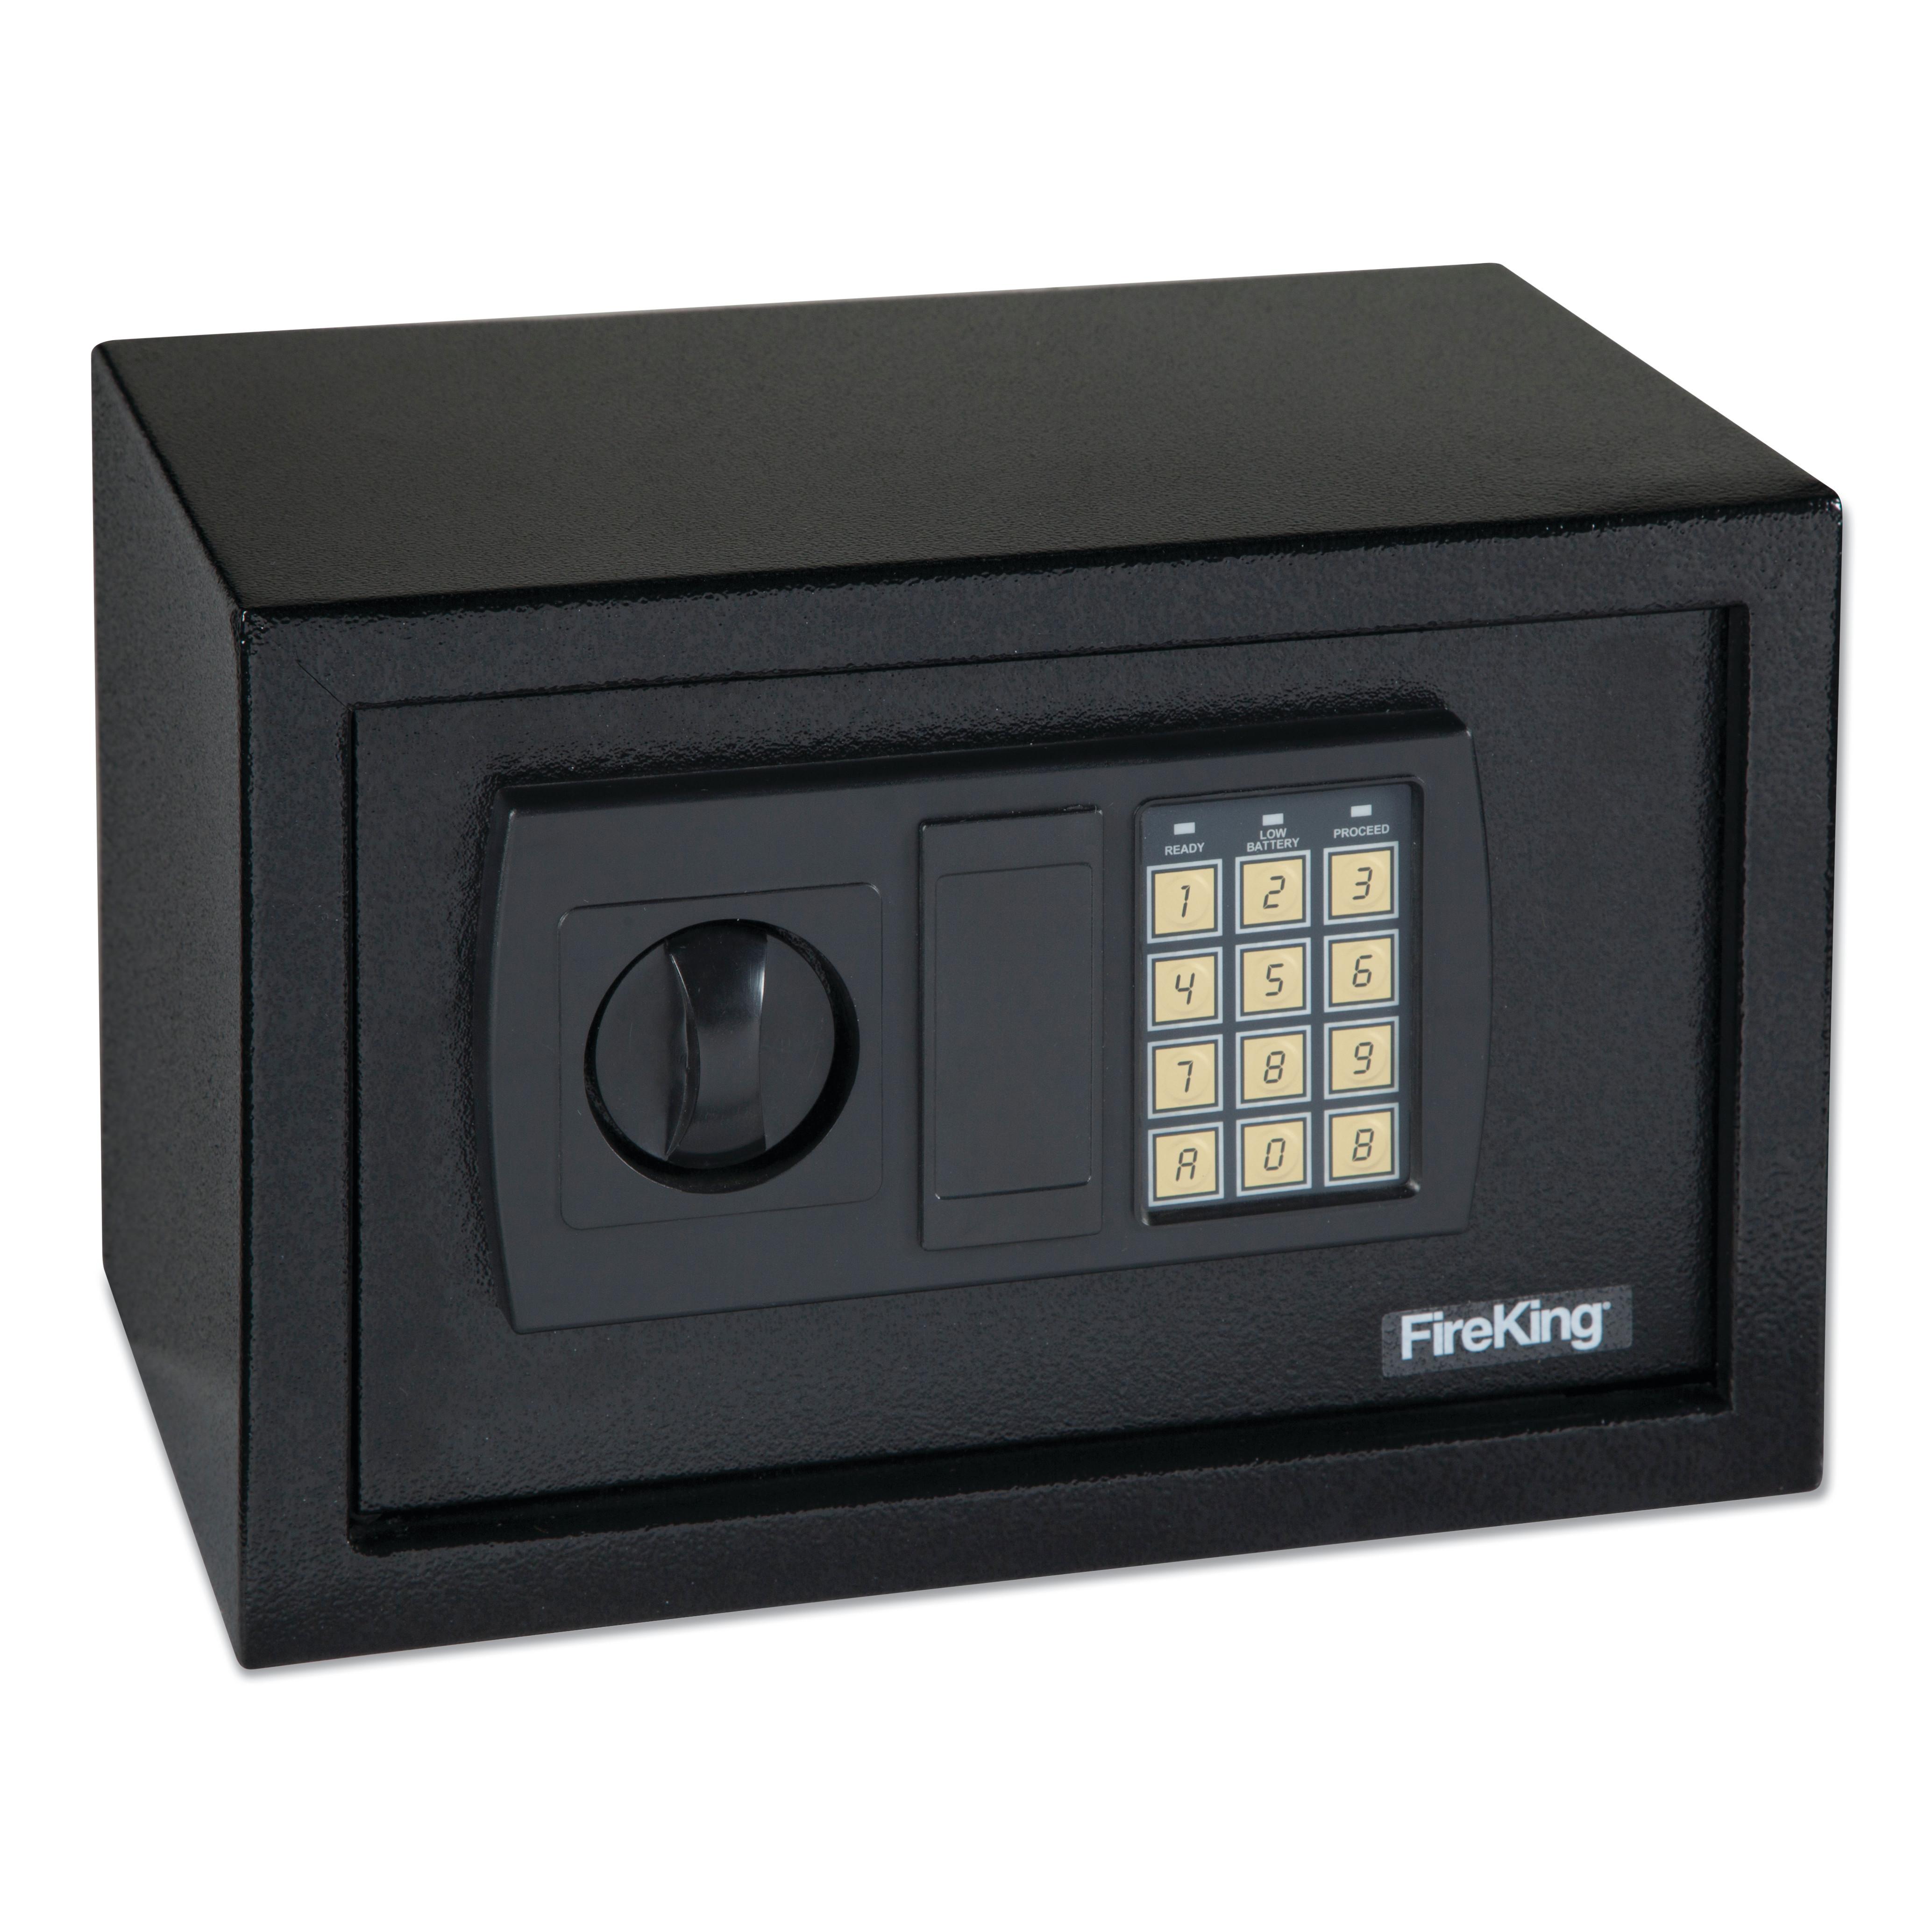 Small Personal Safe, 0.3 cu ft, 12.25w x 7.75d x 7.75h, Black